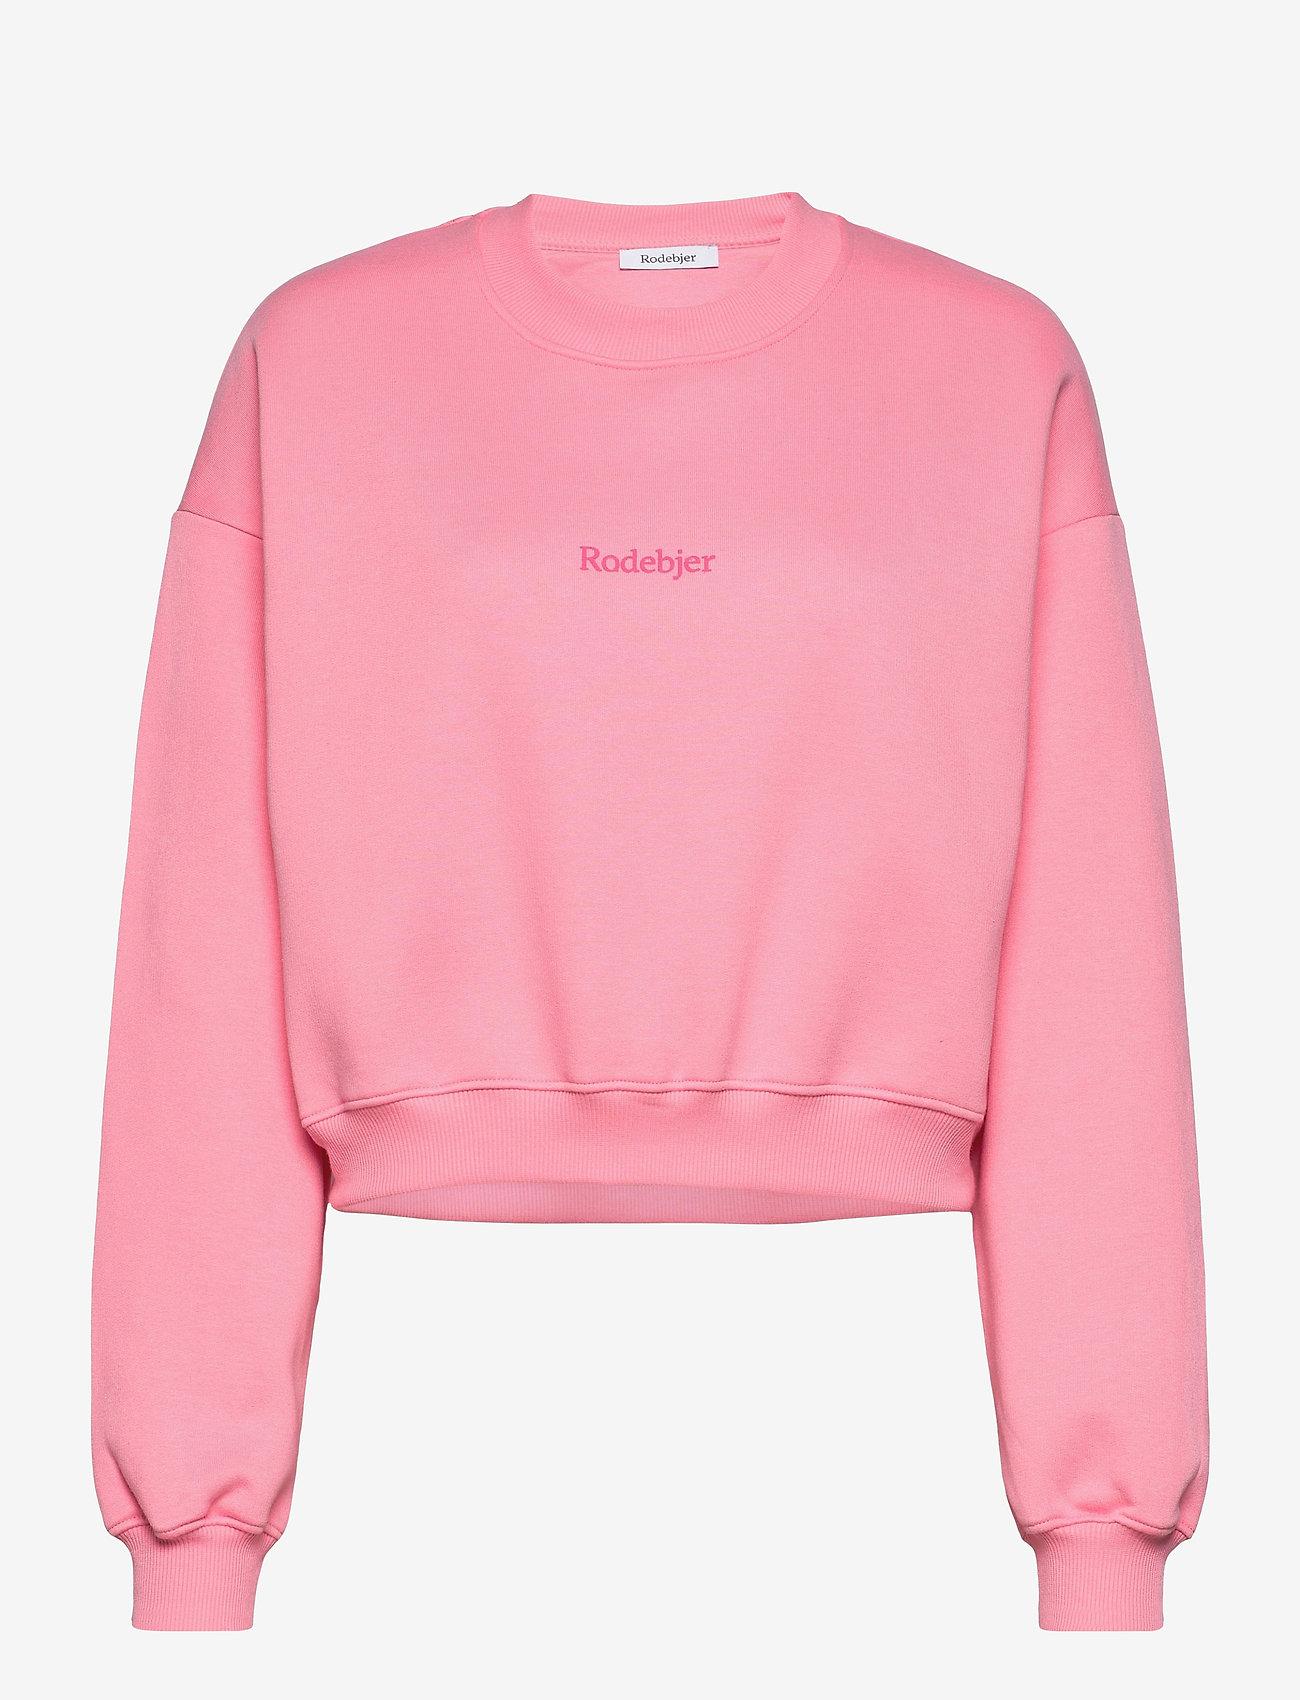 RODEBJER - RODEBJER KOLOMAN - sweatshirts & hættetrøjer - cherry blossom - 0